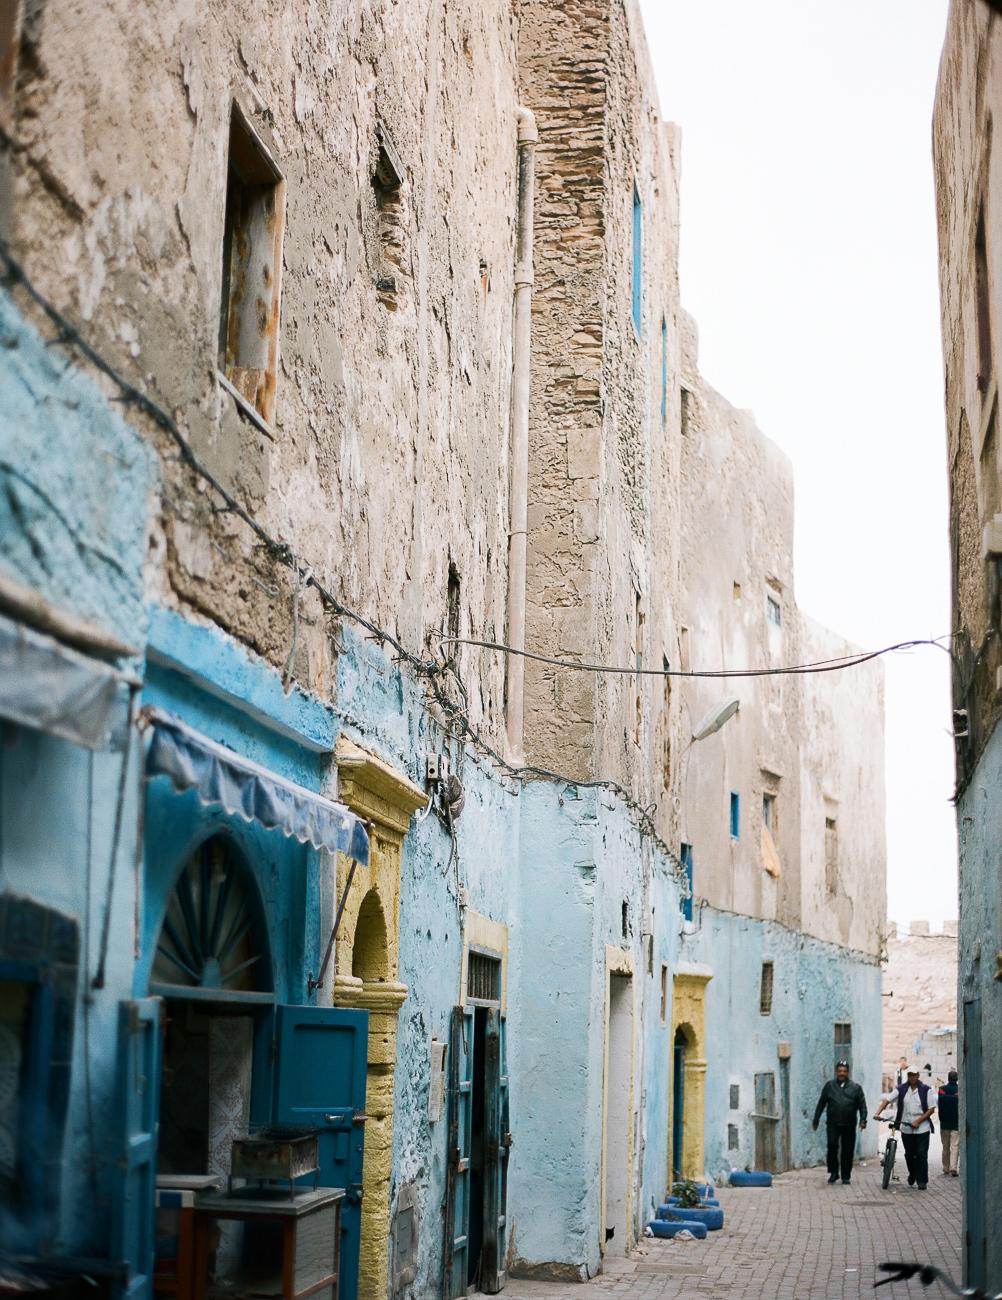 marrakech-photographe-voyage-alain-m-9.jpg